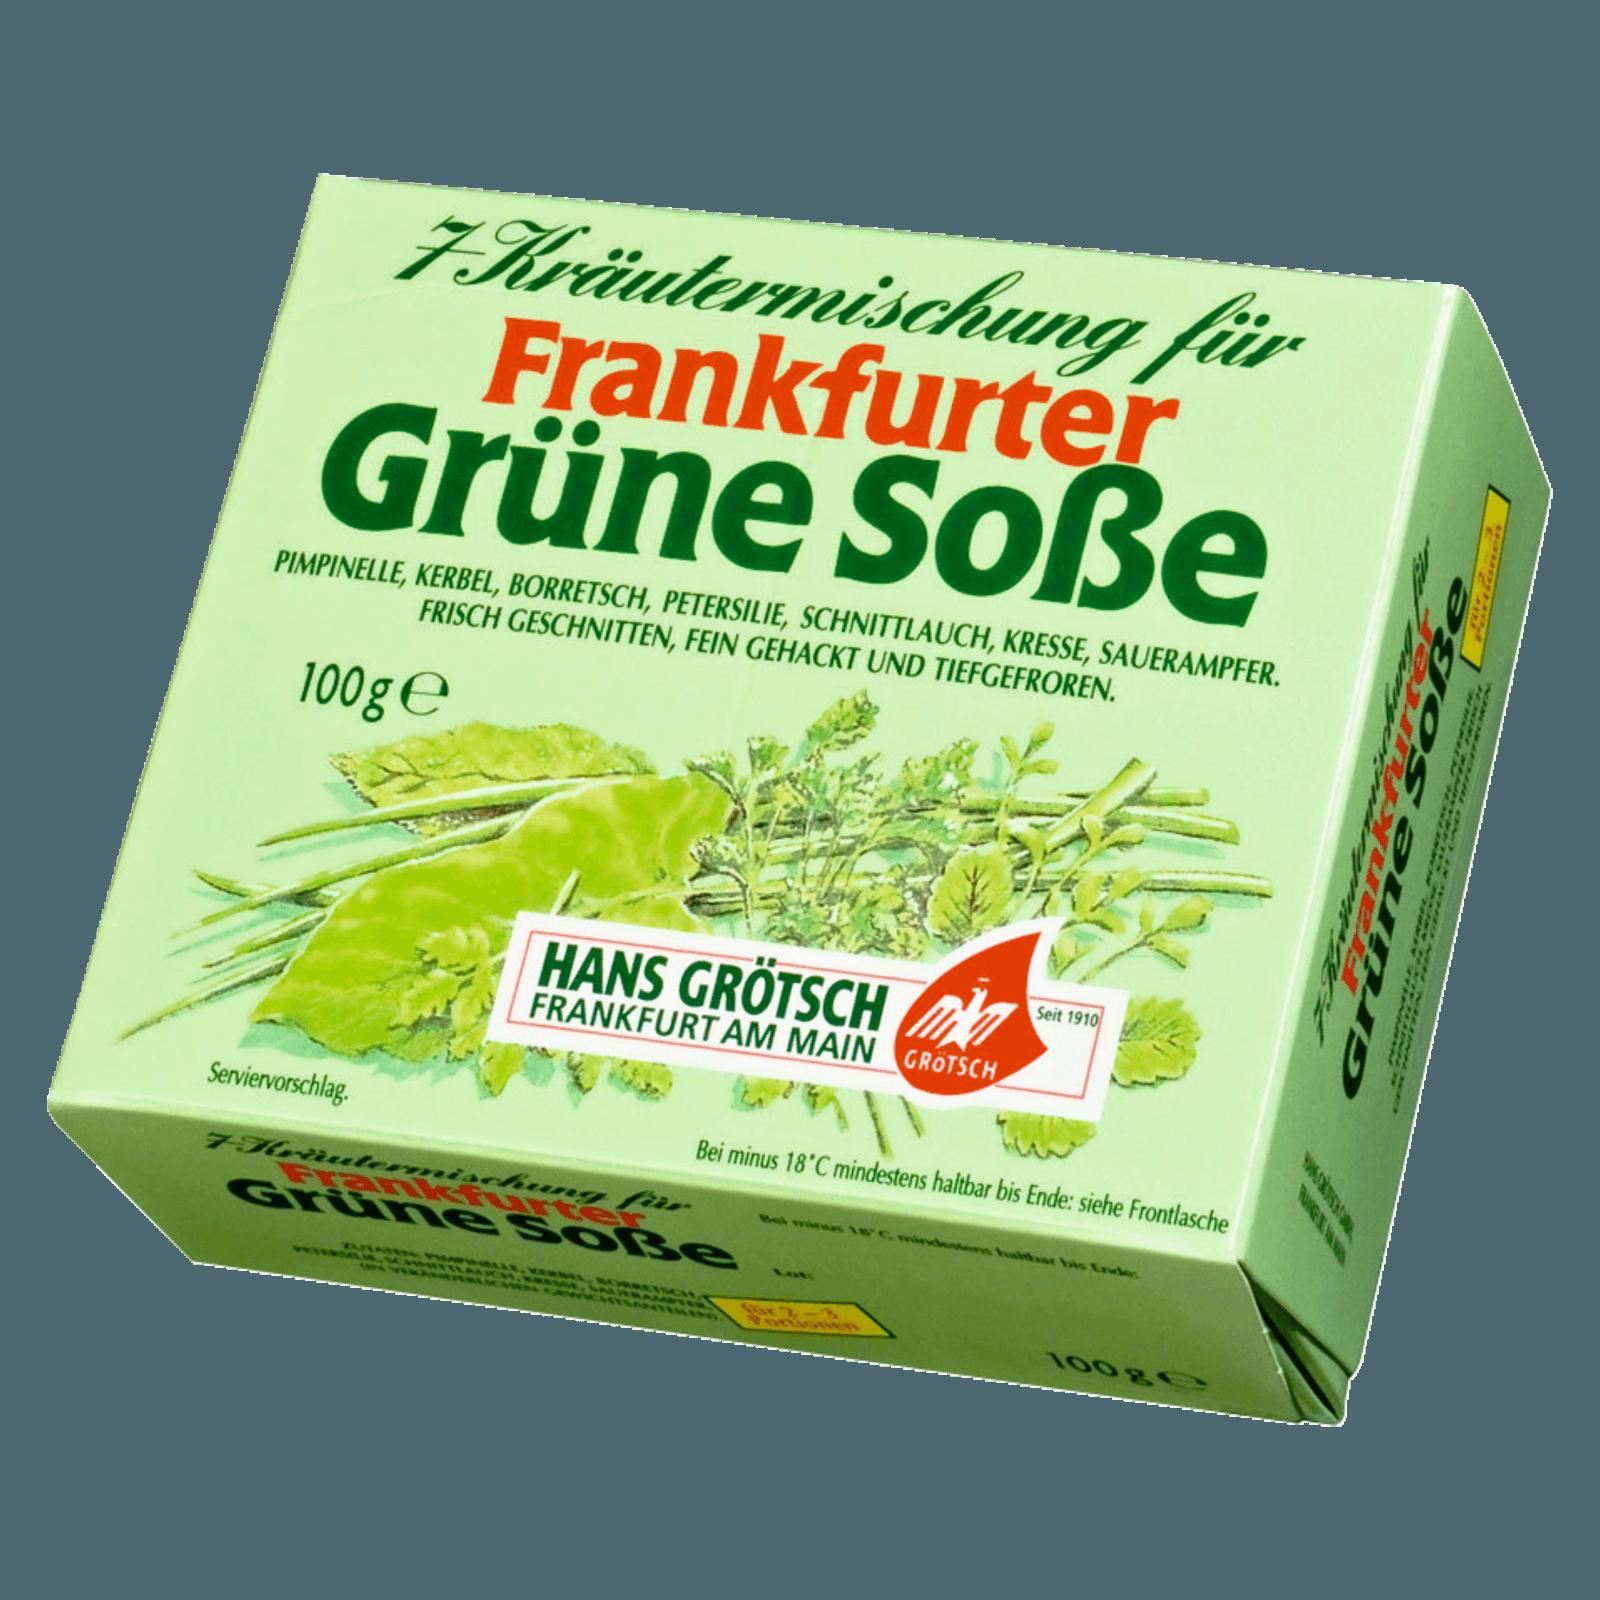 Frankfurter grüne soße kräuter